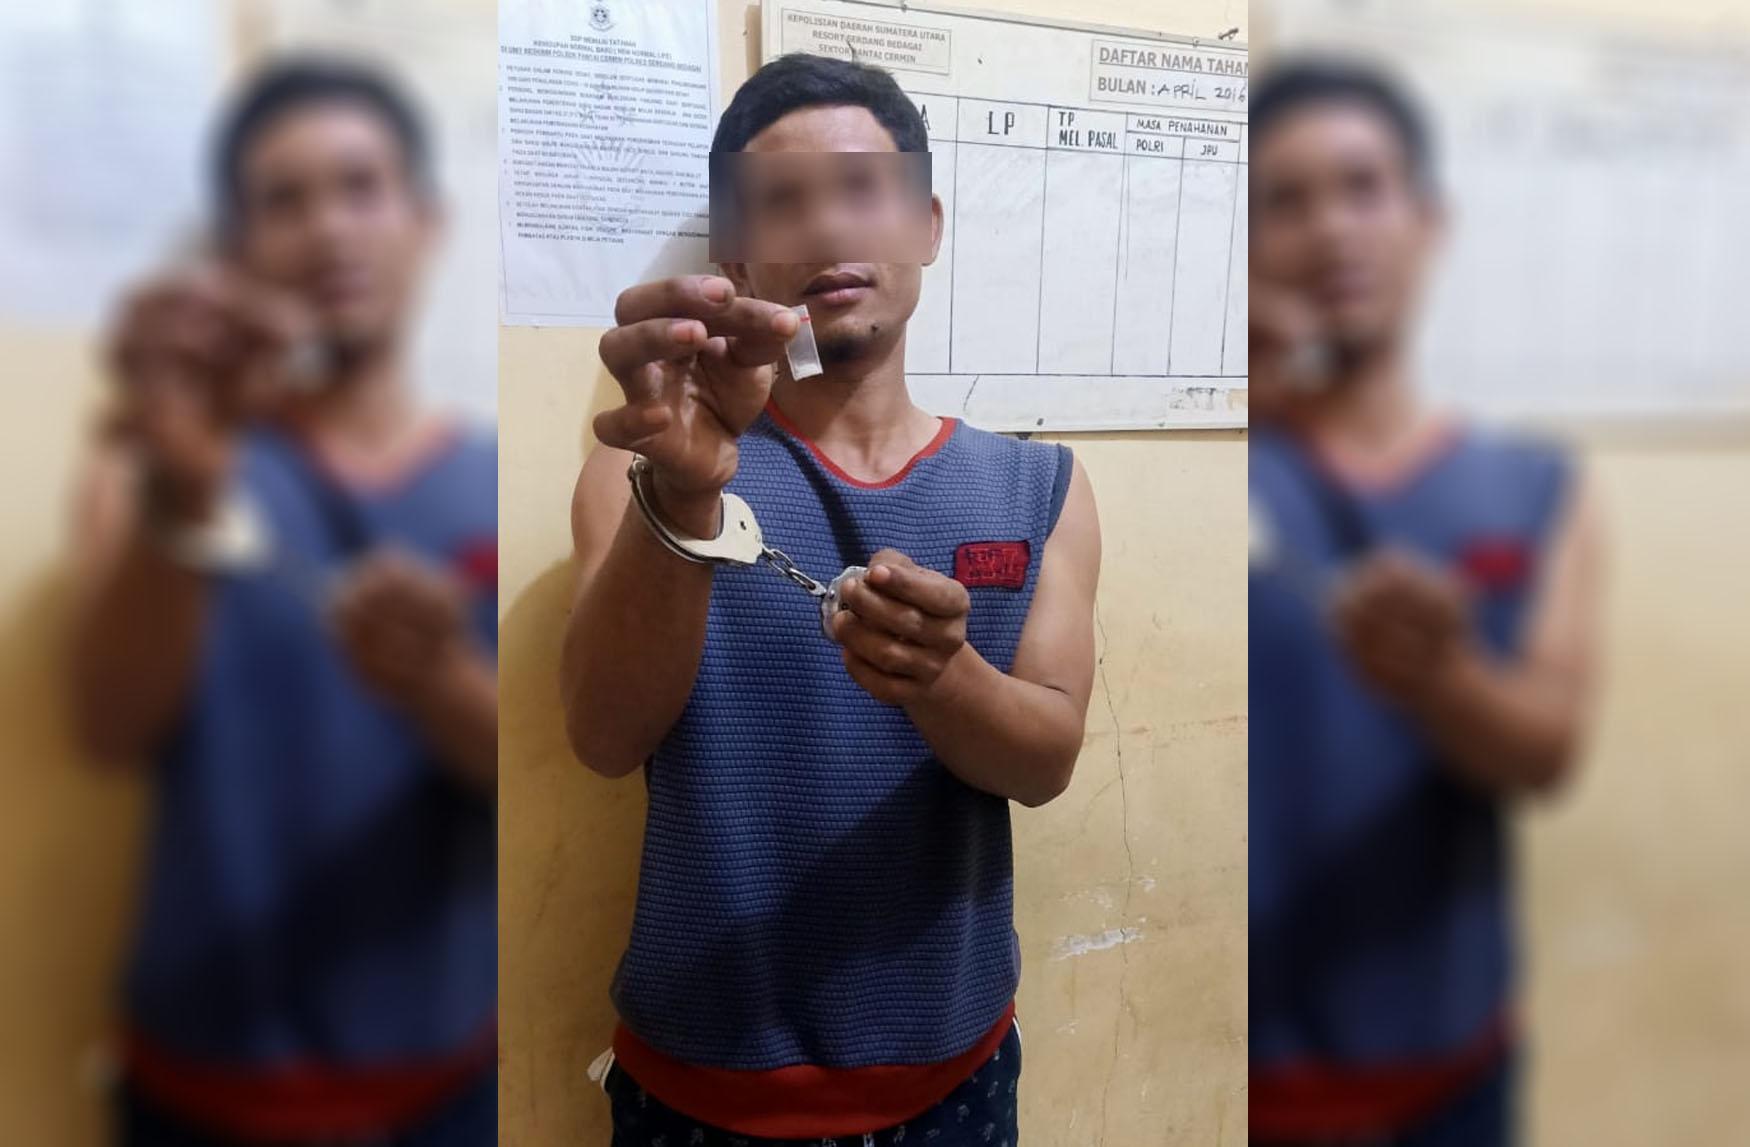 Usai Transaksi Sabu, Pria di Sergai Digrebek Polsek Pantai Cermin